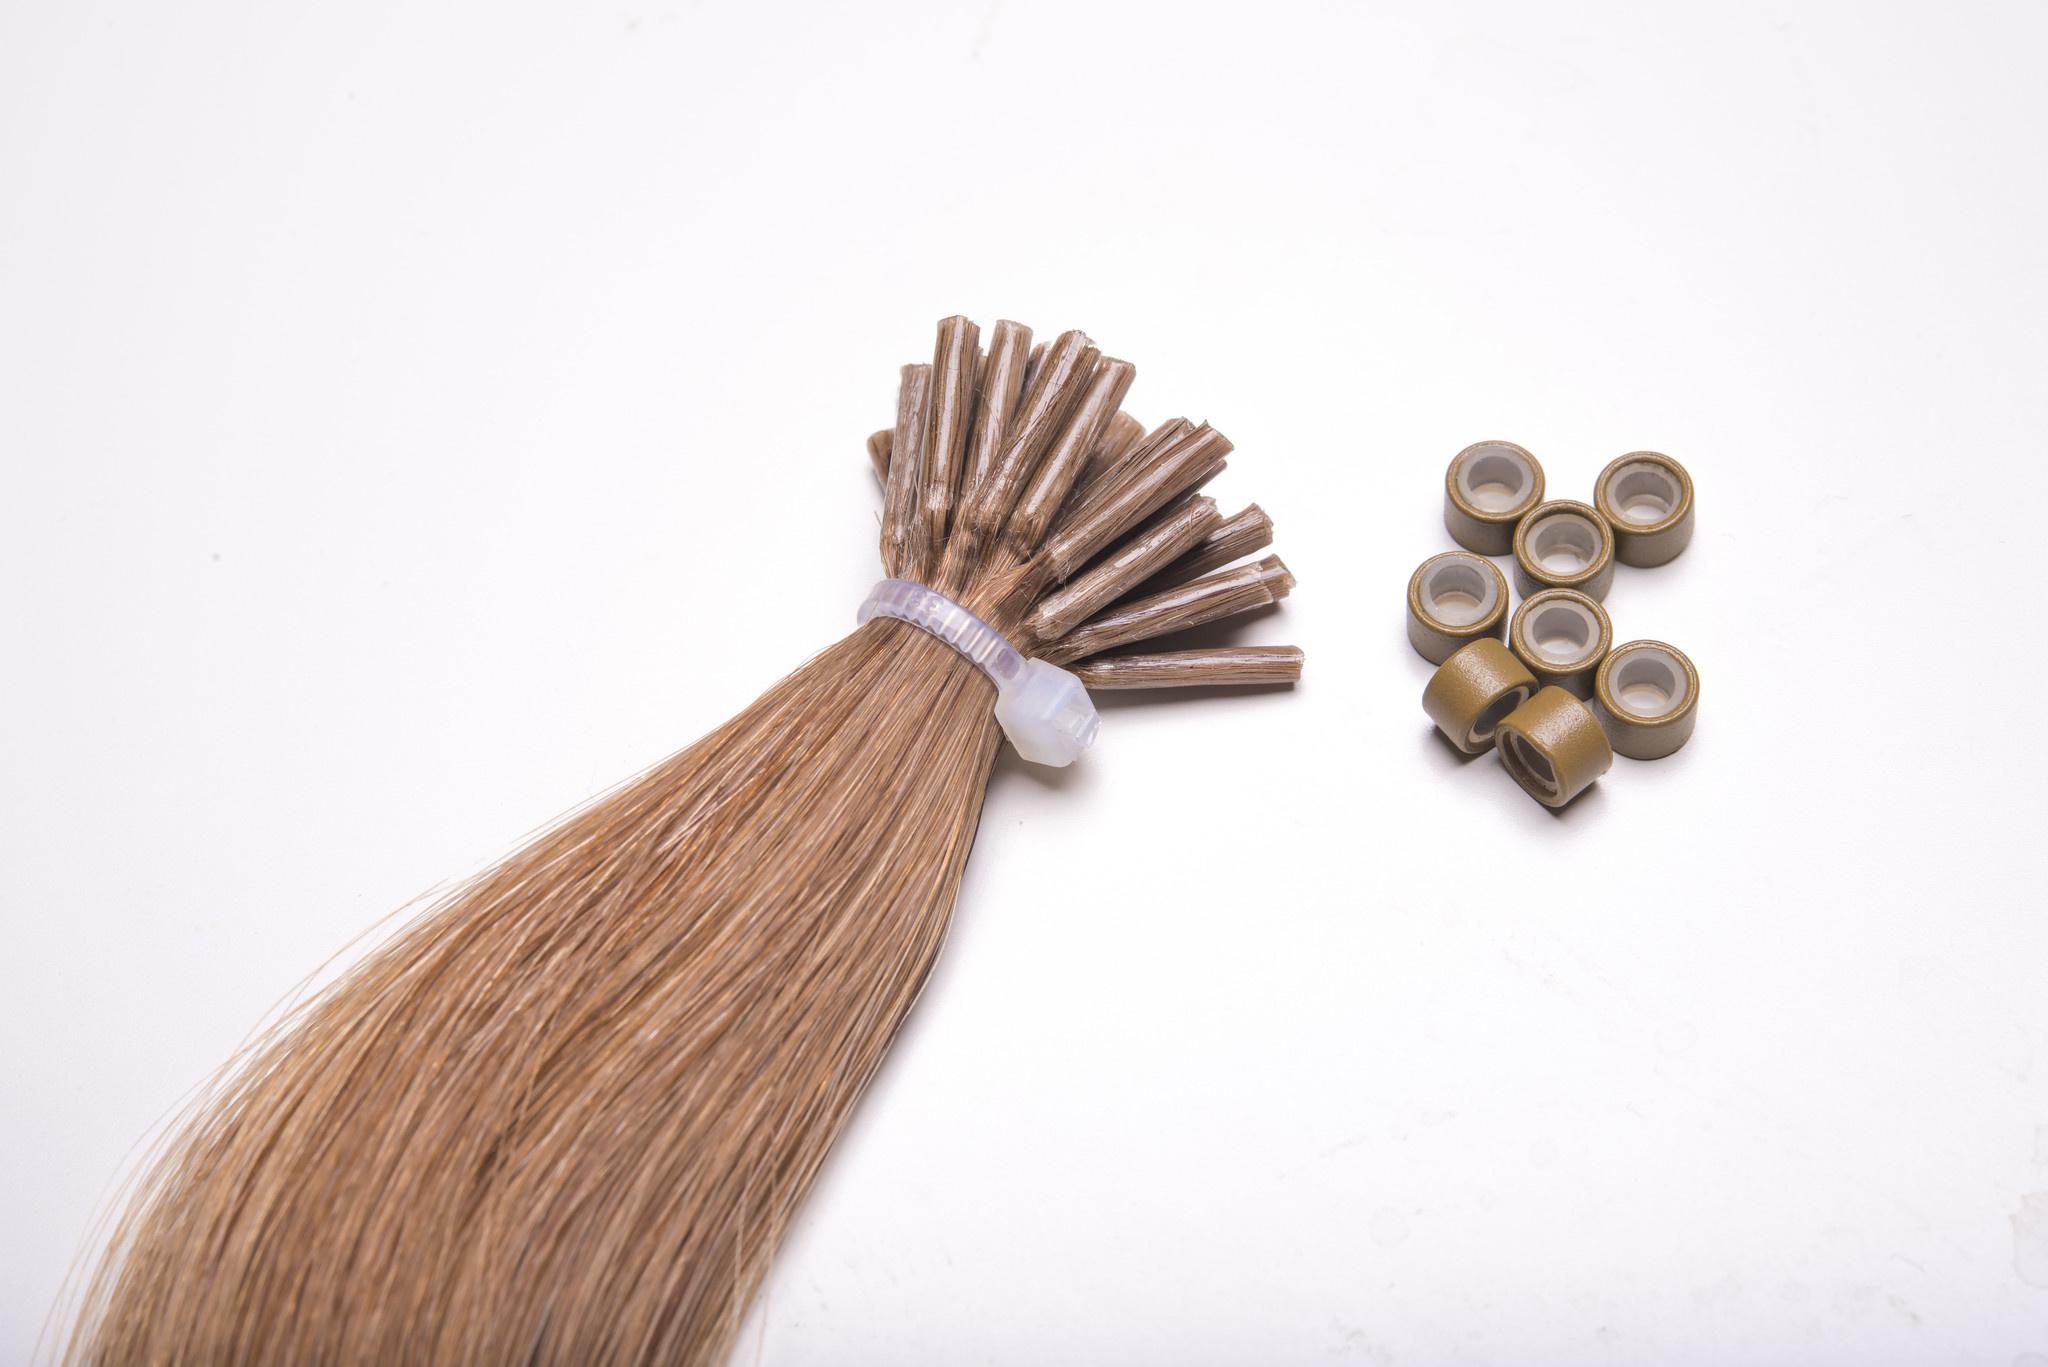 SilverFox Microring Extensions - Steil -  #27 Dark Blonde